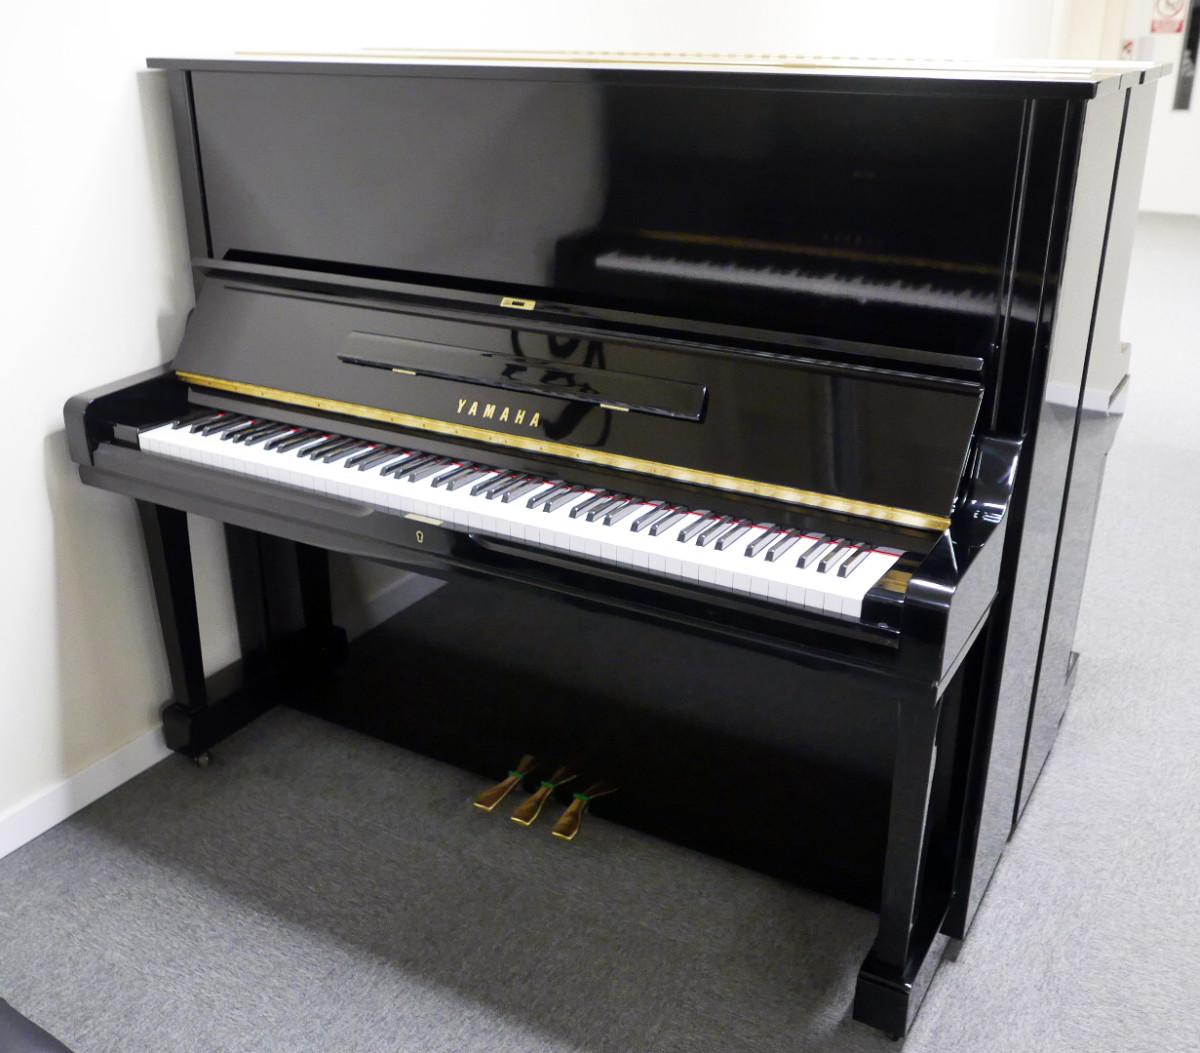 piano vertical Yamaha U3 #3788238 vista general tapa abierta